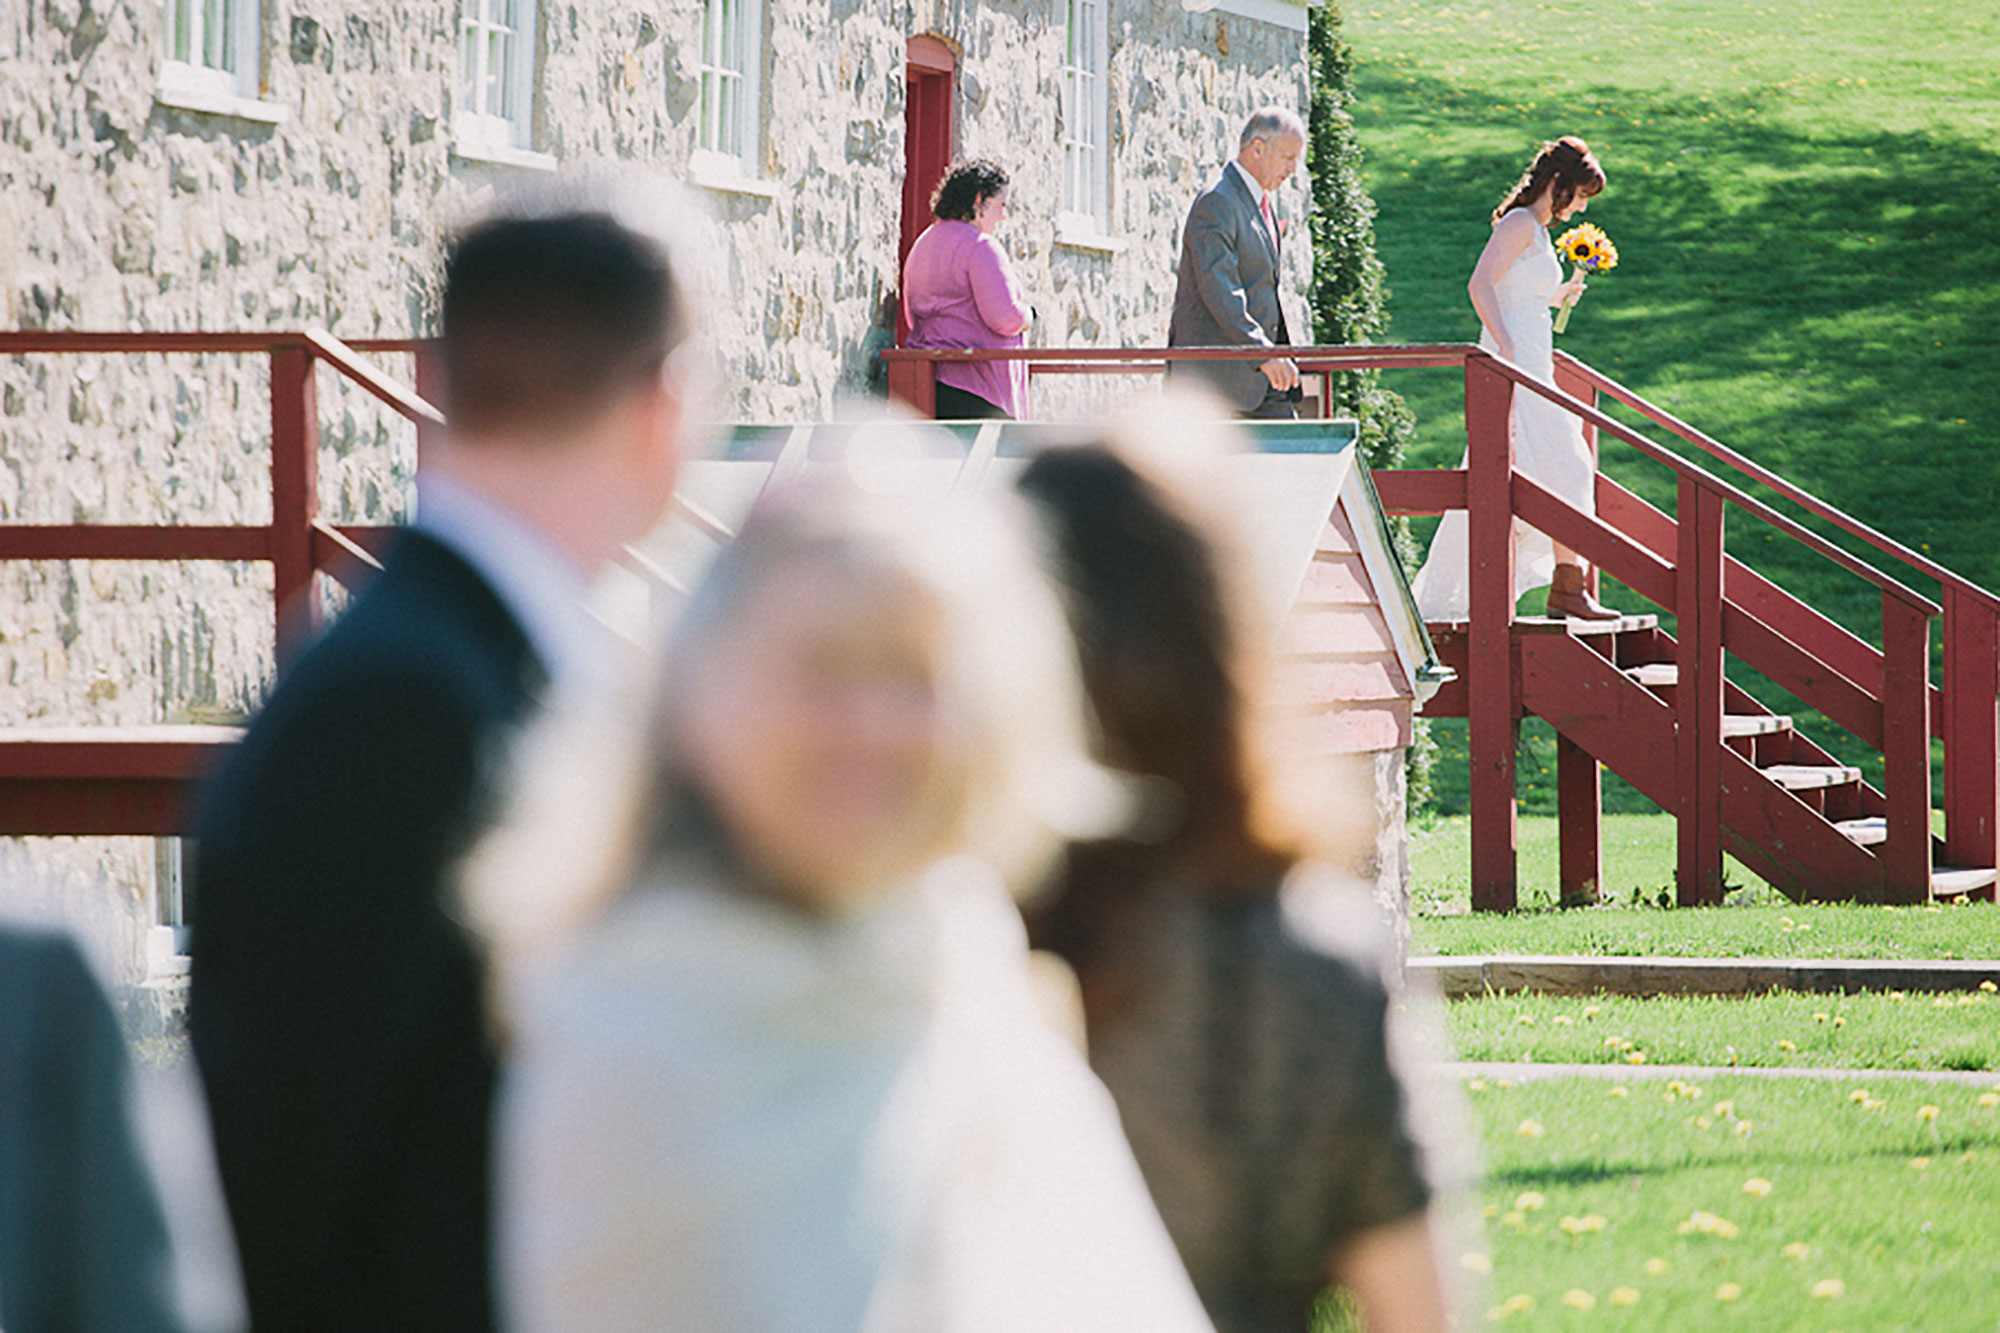 Navy-Hall-Wedding-Vineyard-Bride-Photo-By-Andrew-Mark-Photography-029.jpg